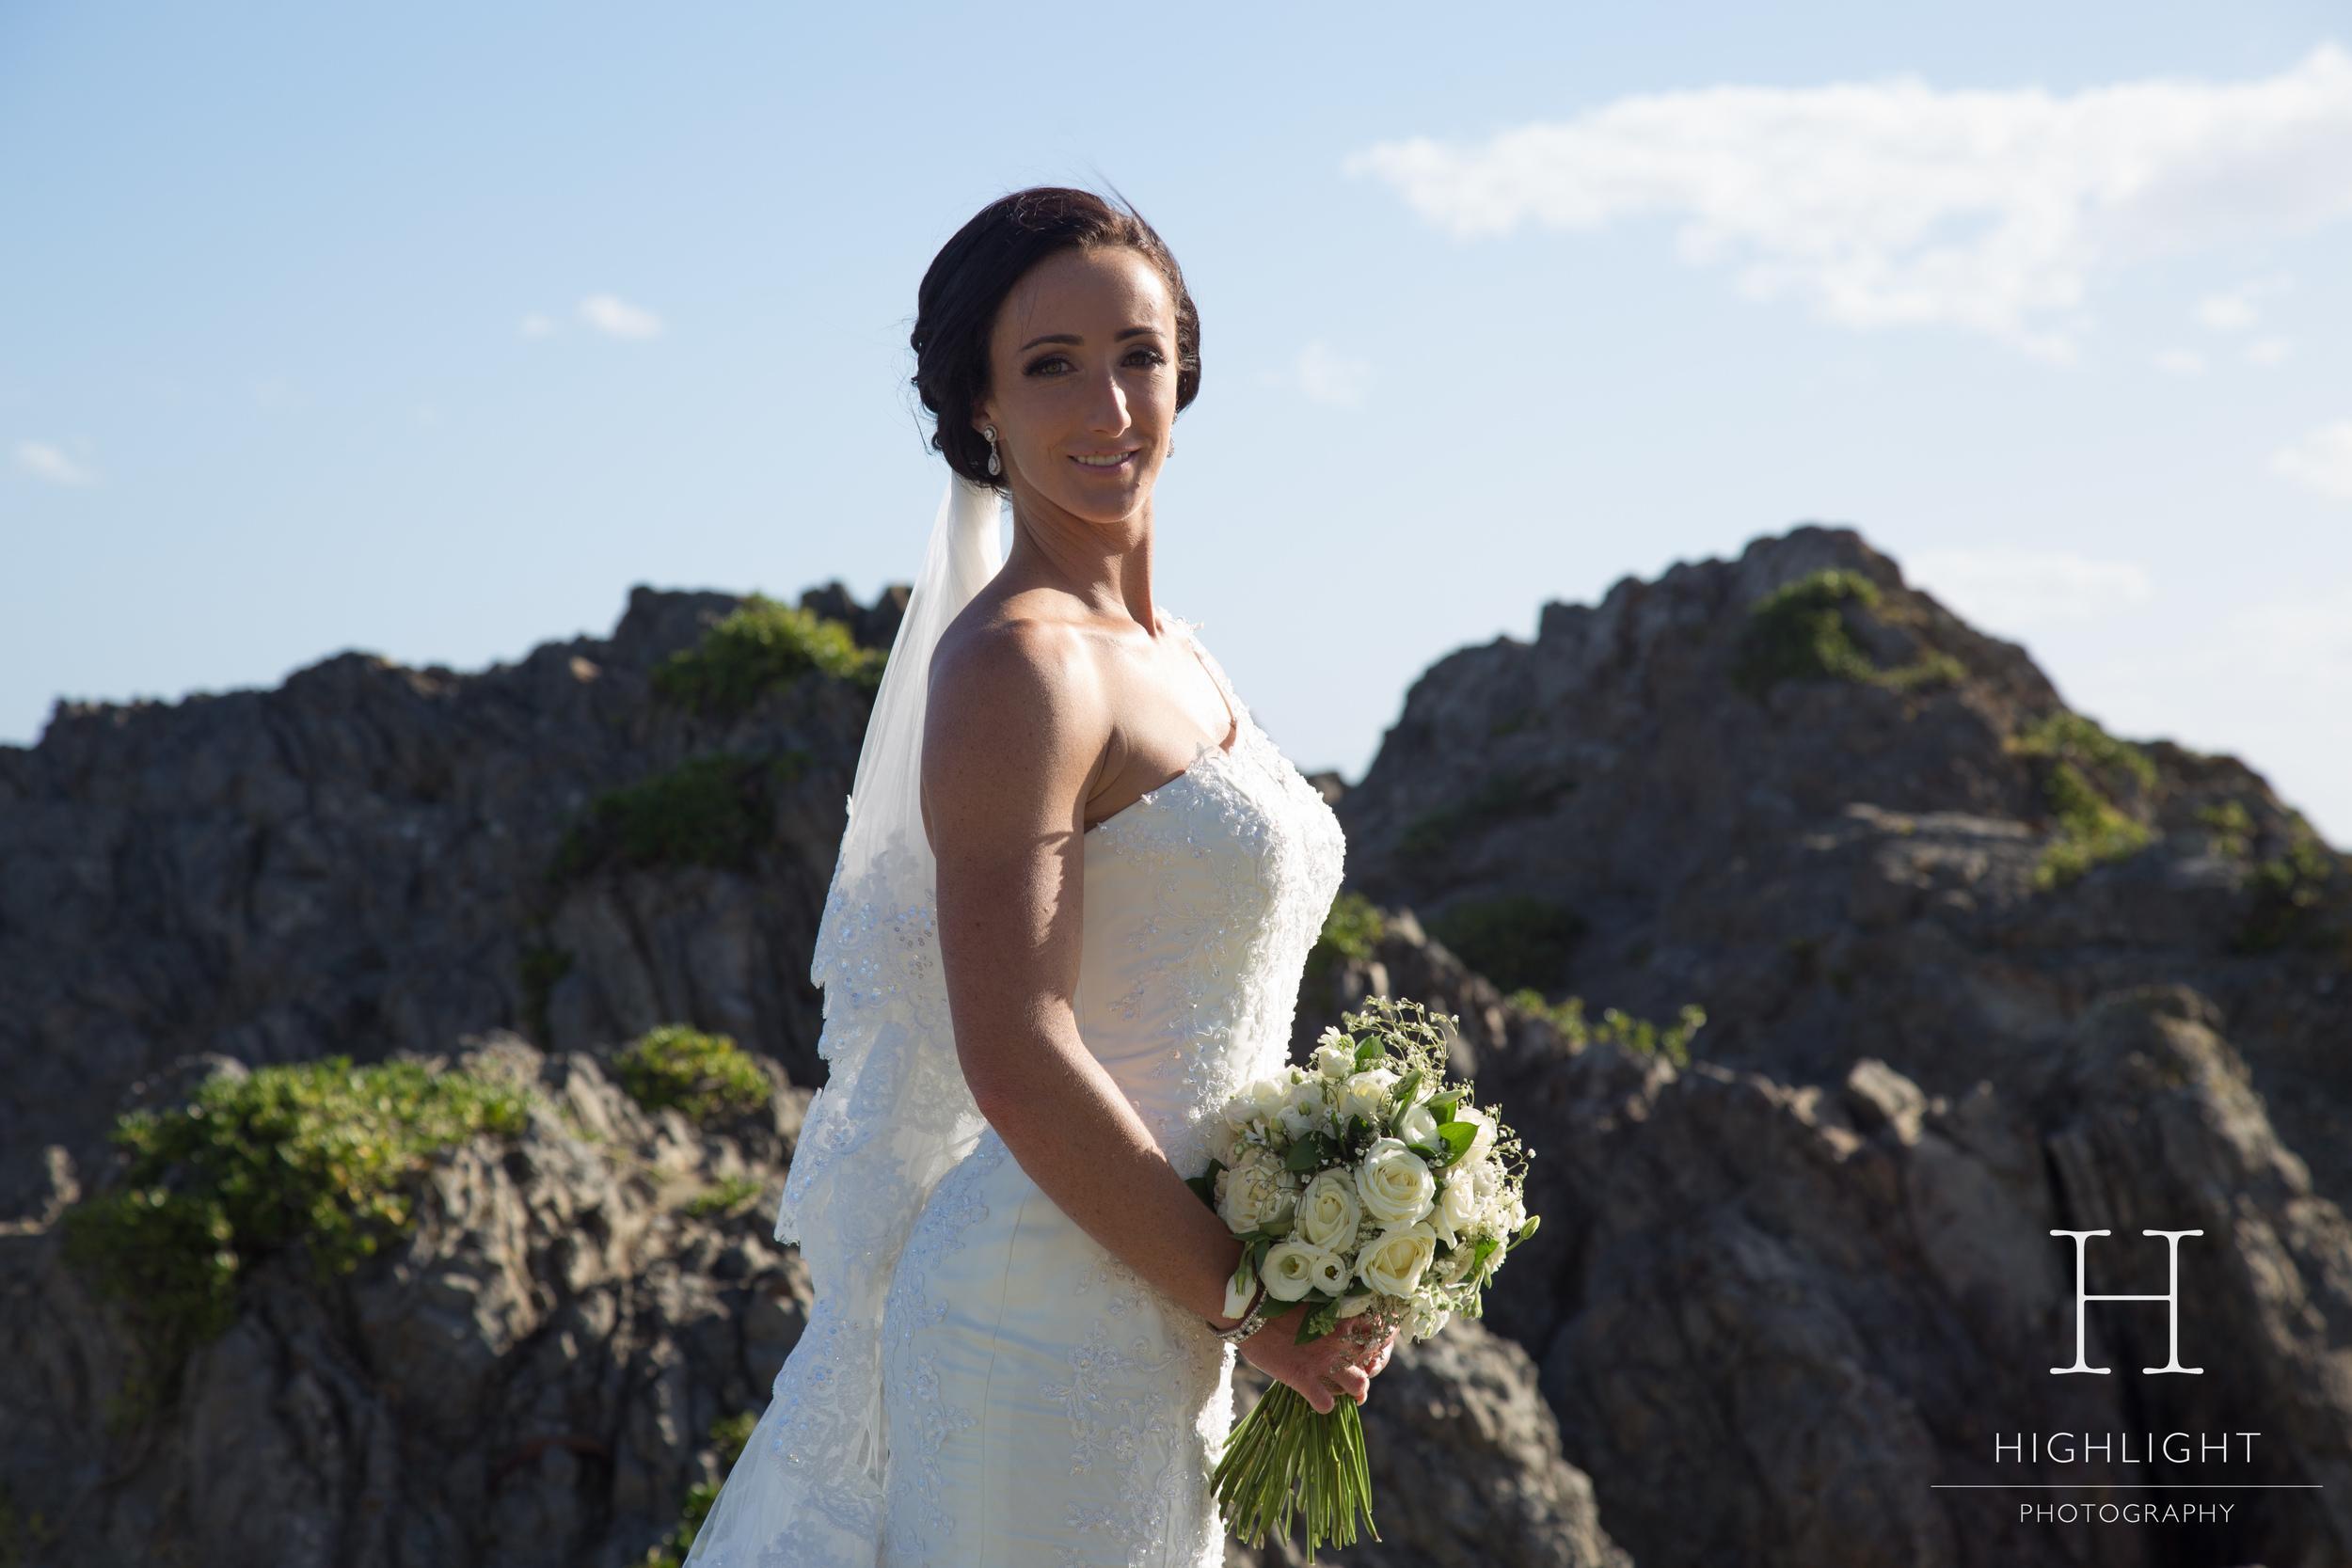 highlight_kc_beach_bride_wellington_wedding.jpg